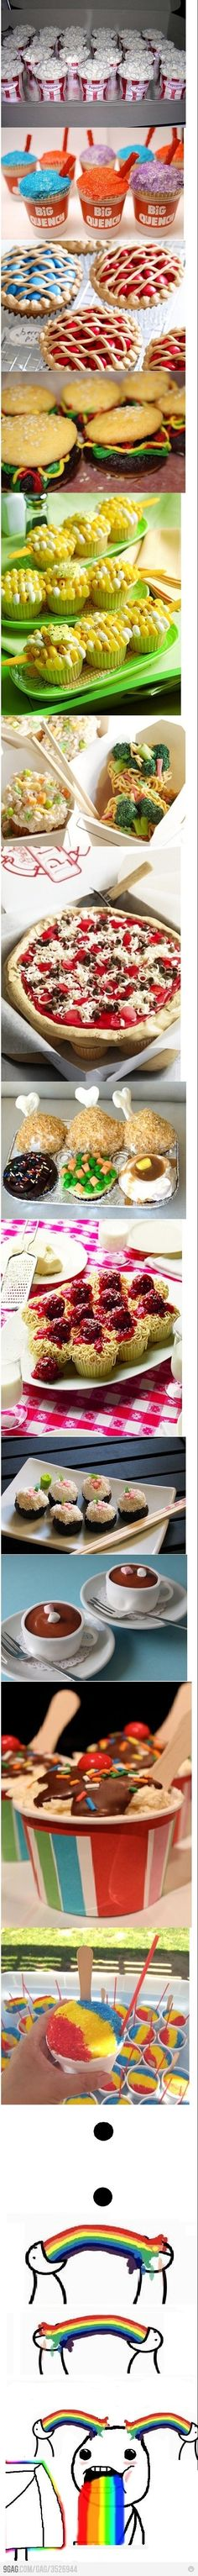 Cupcakes! #cupcake #food